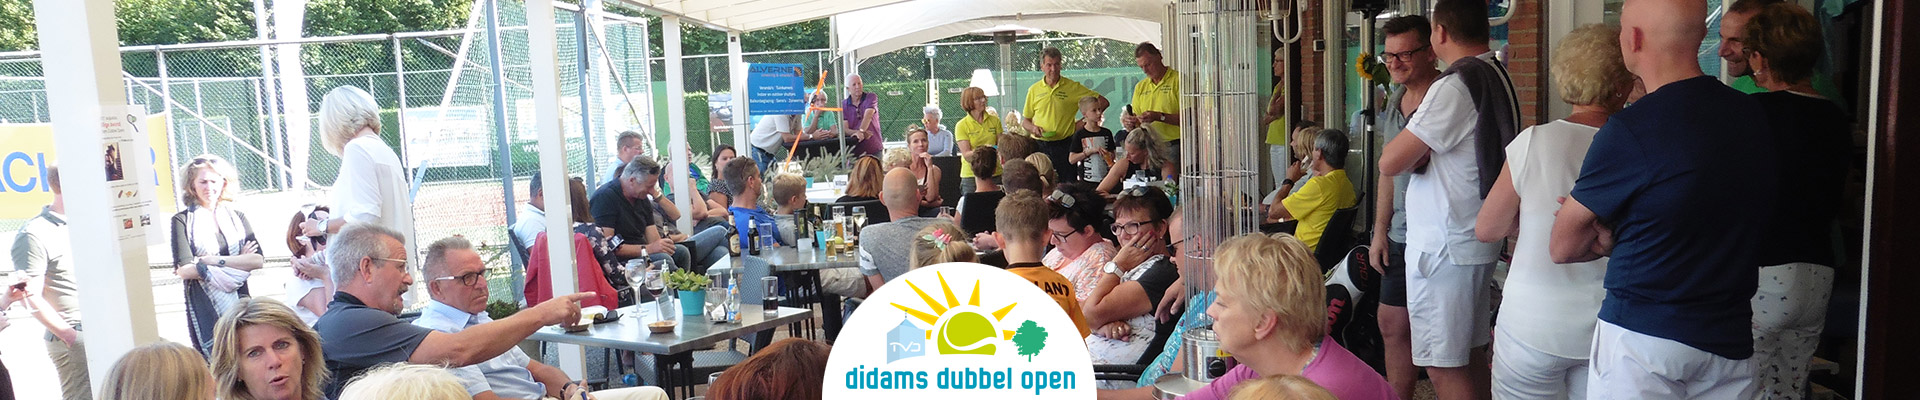 tvd_slider_didams_dubbel_open_logo